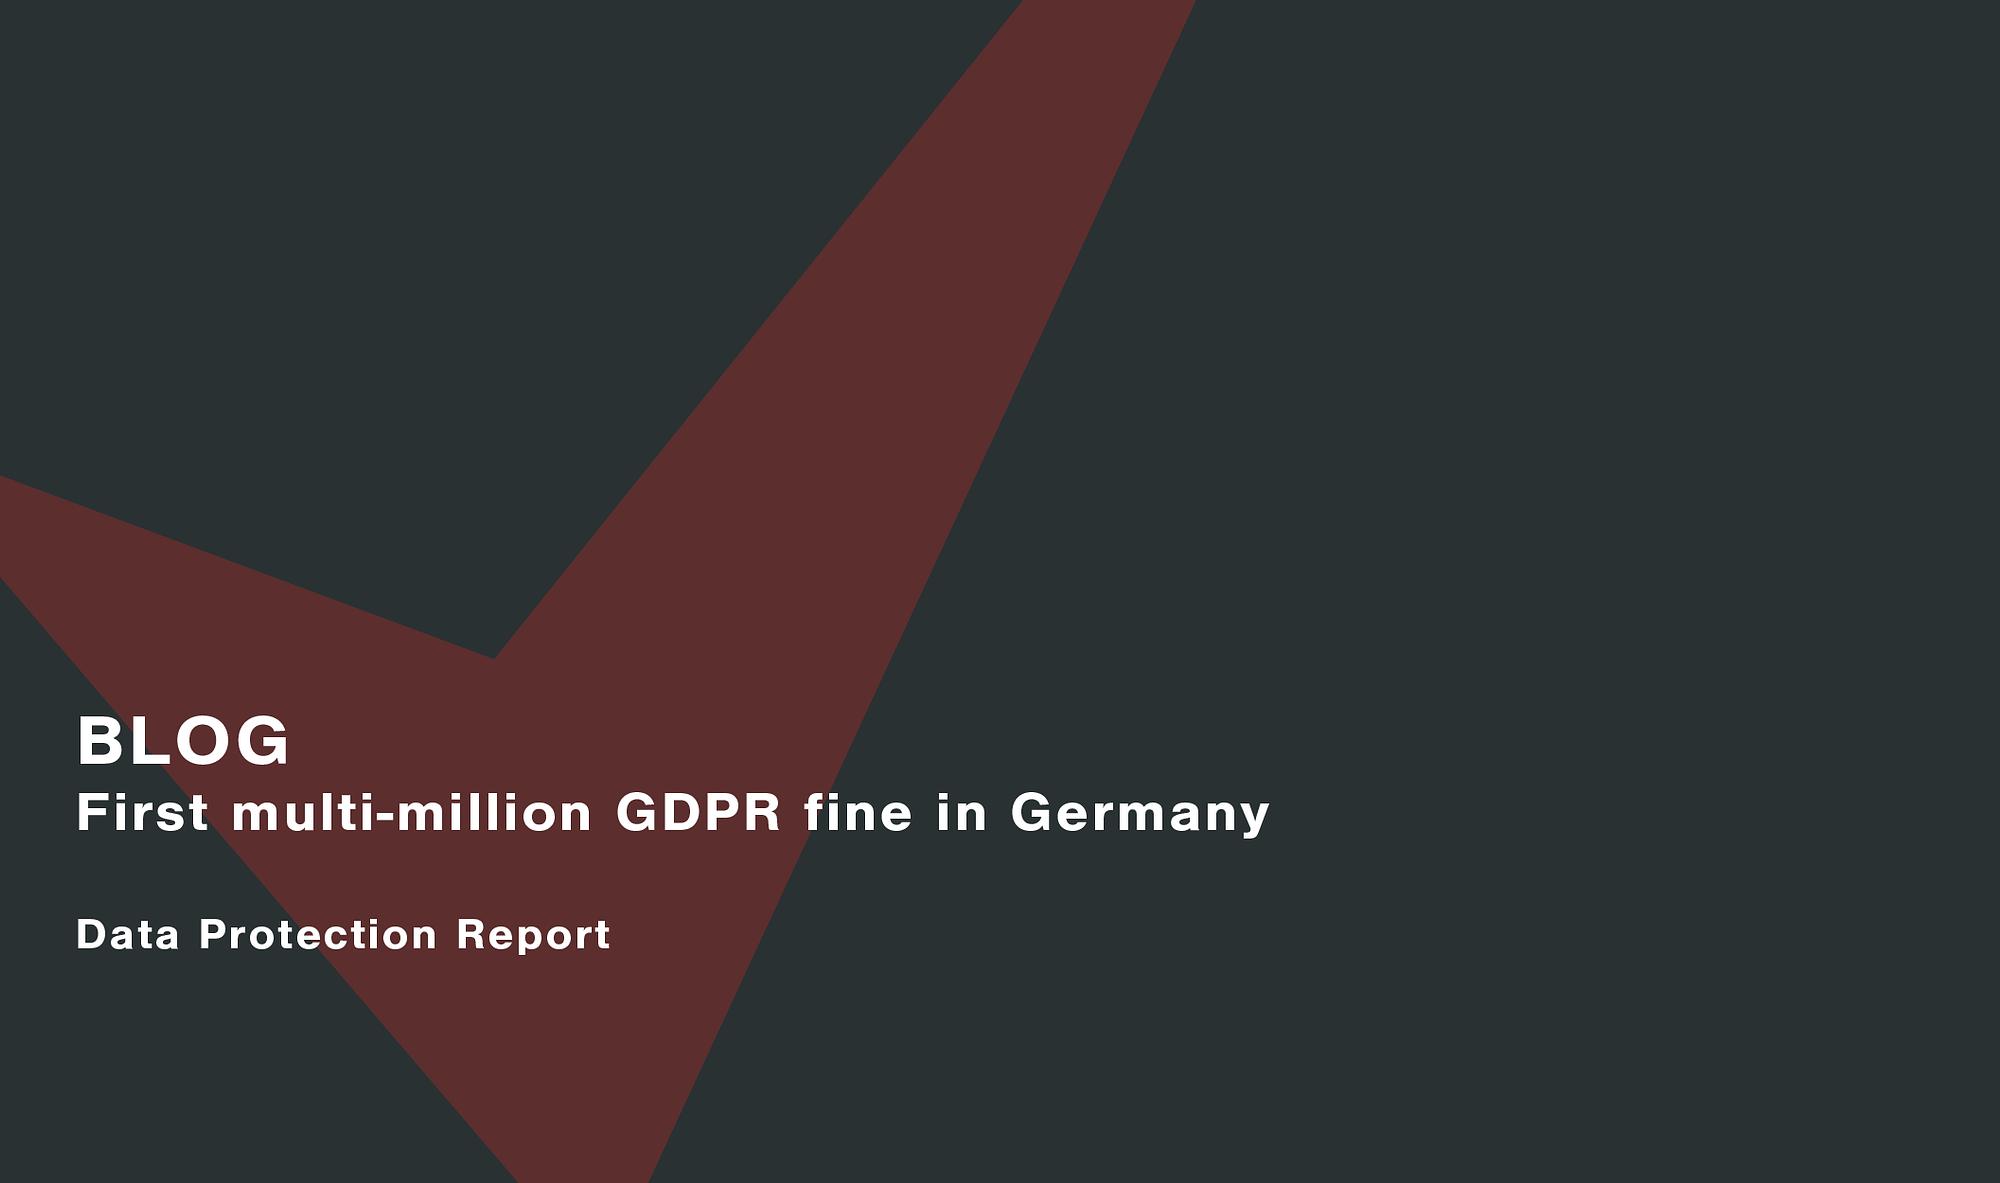 First-multi-million-GDPR-fine-in-Germany